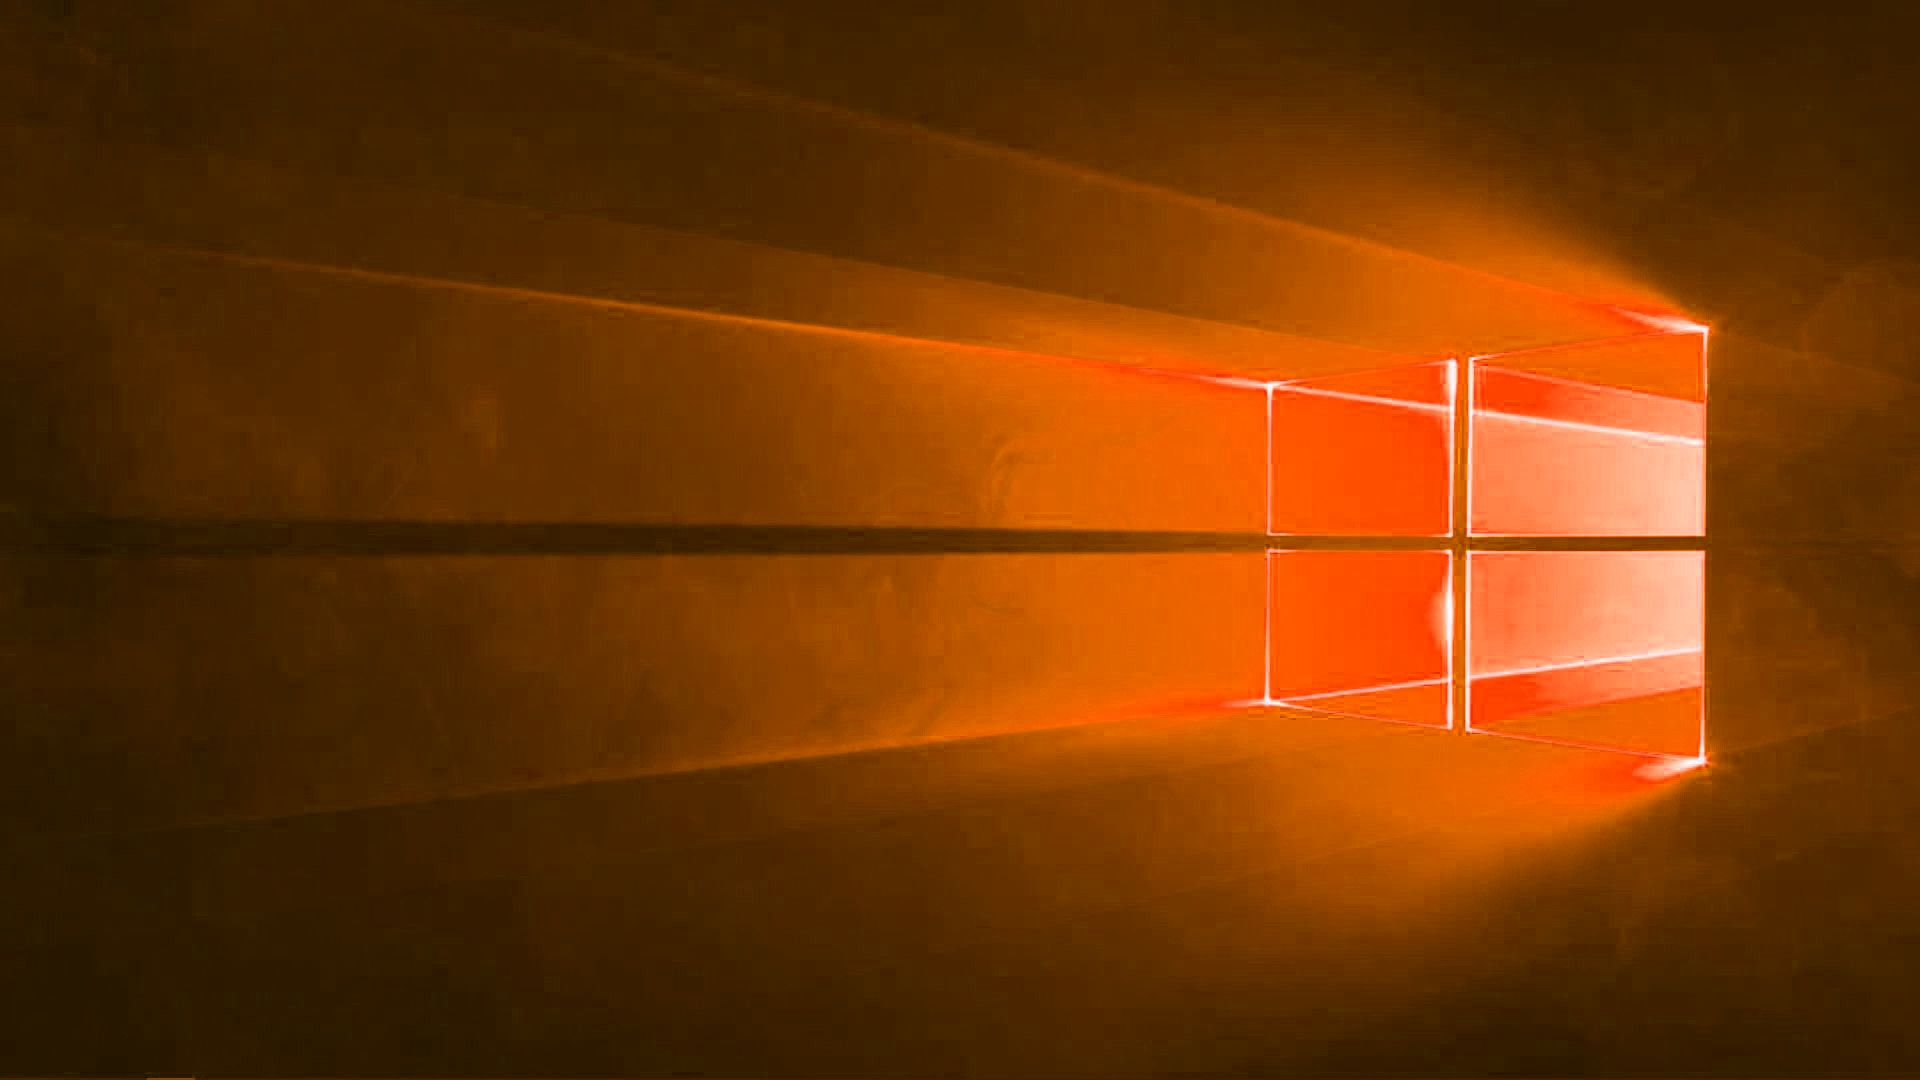 1920x1080 Windows 10 Red Wallpaper 1920x1080 Wallpaper Windows 10 Red Wallpaper Windows Wallpaper